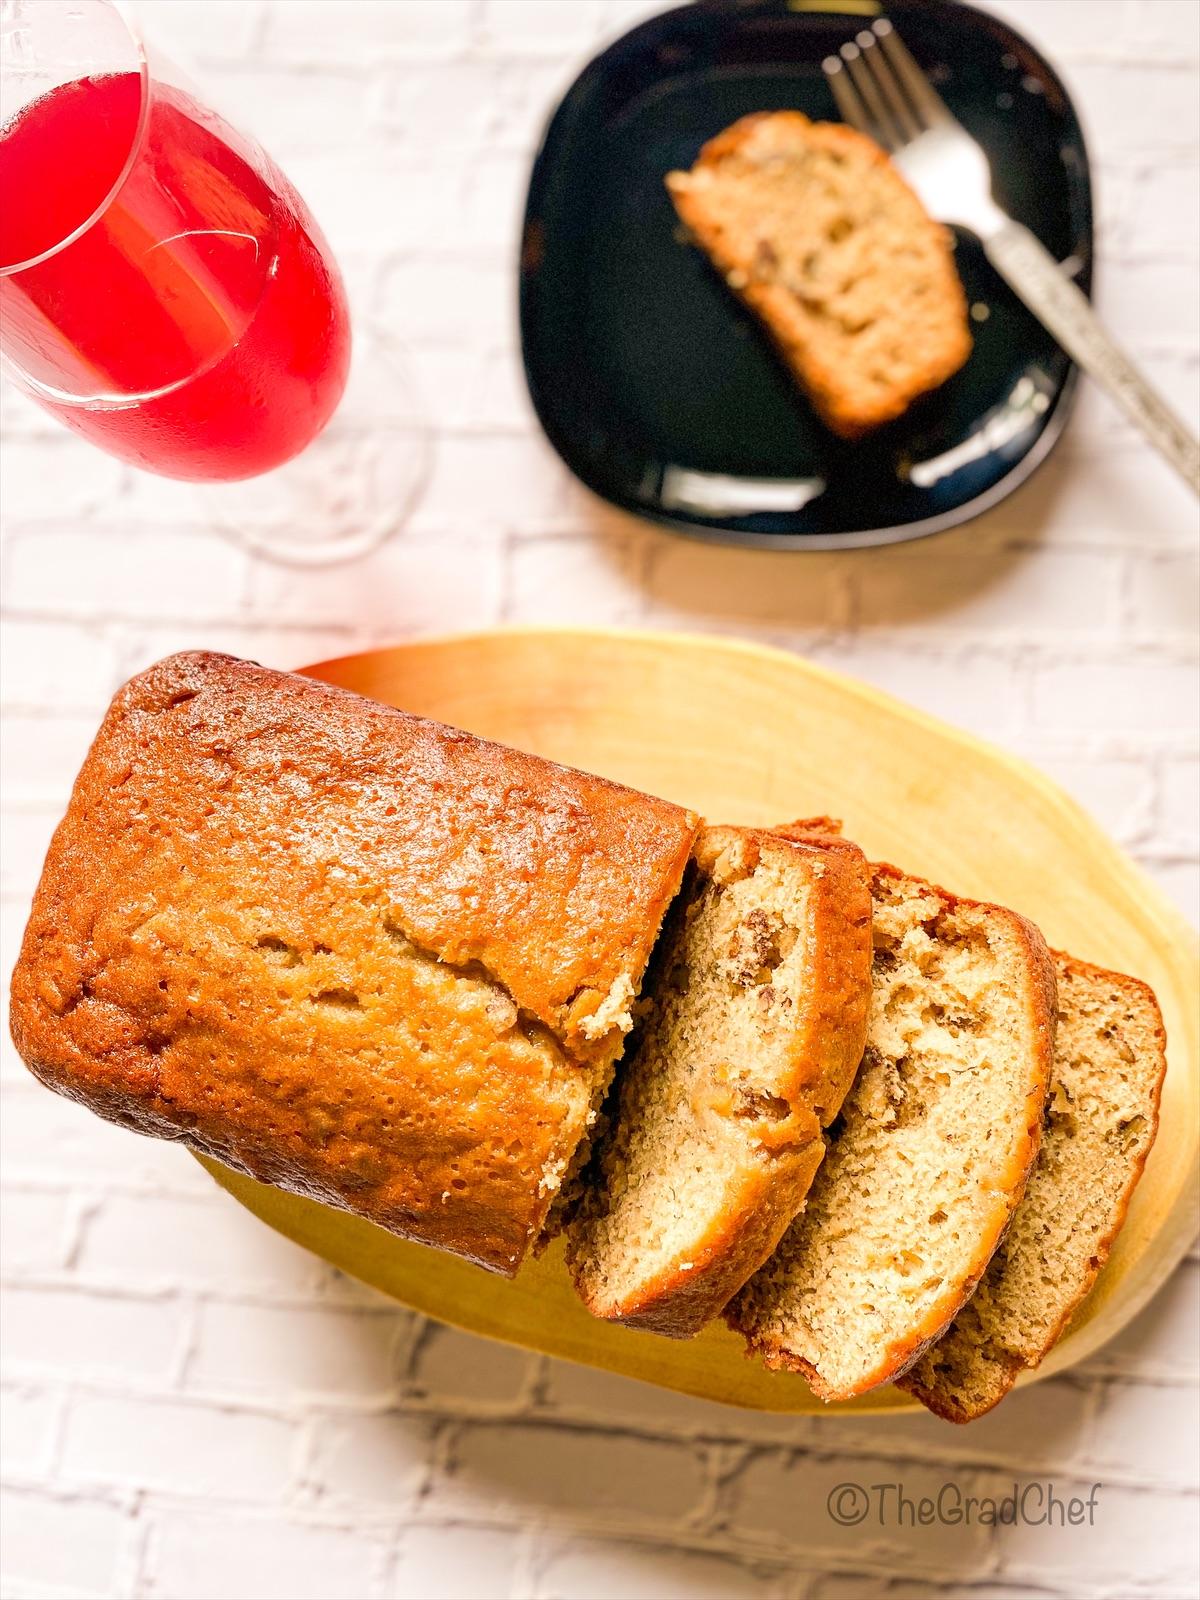 ORANGE BANANA-NUT CAKE